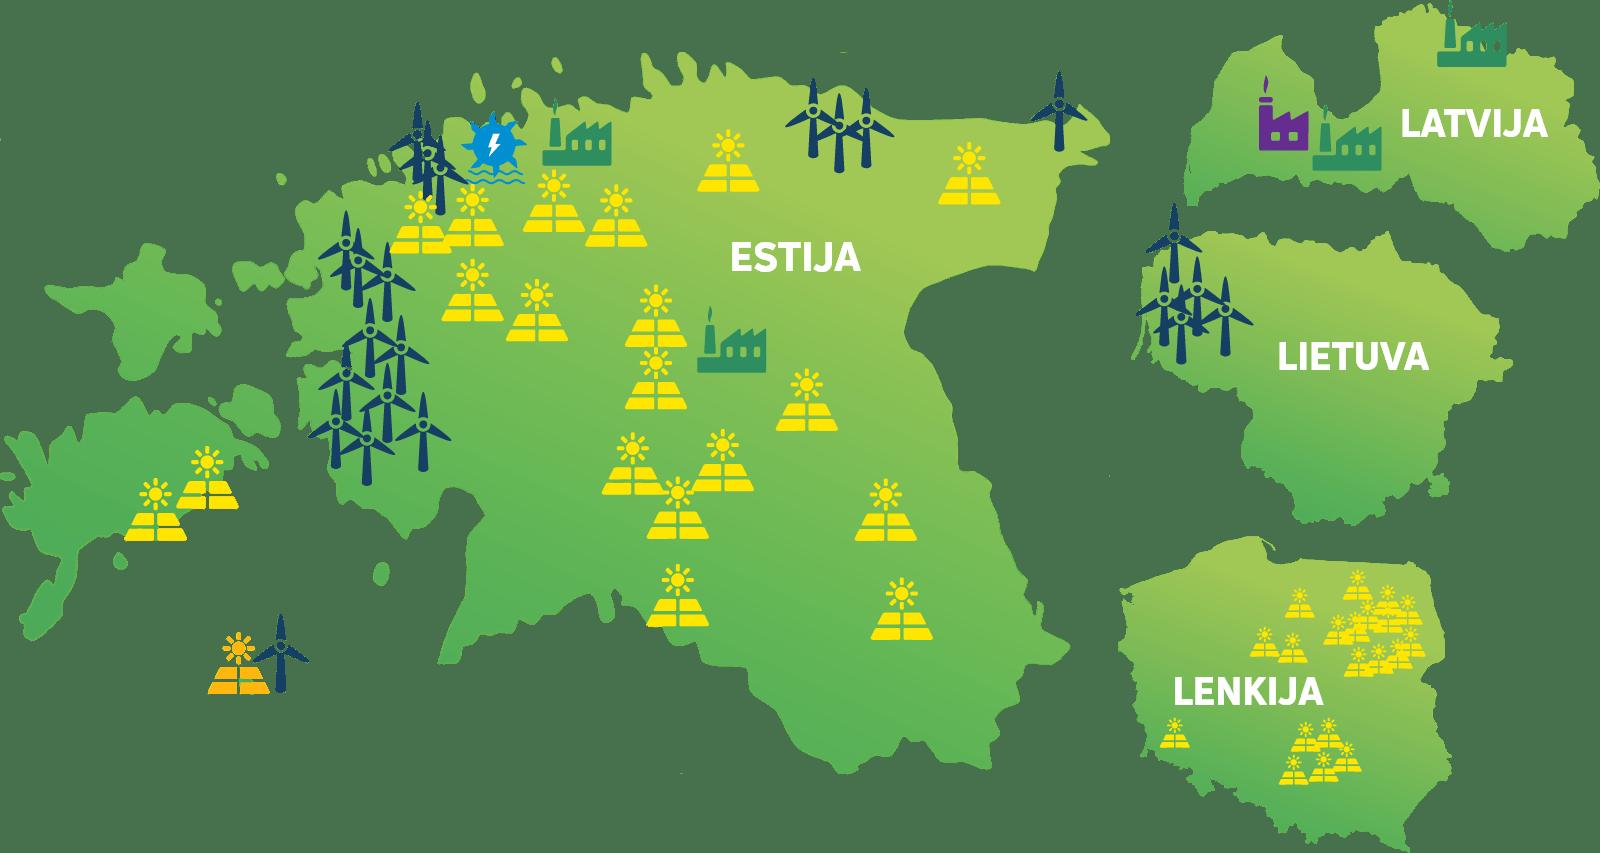 We currently produce renewable energy in Estonia, Latvia, Lithuania and Poland